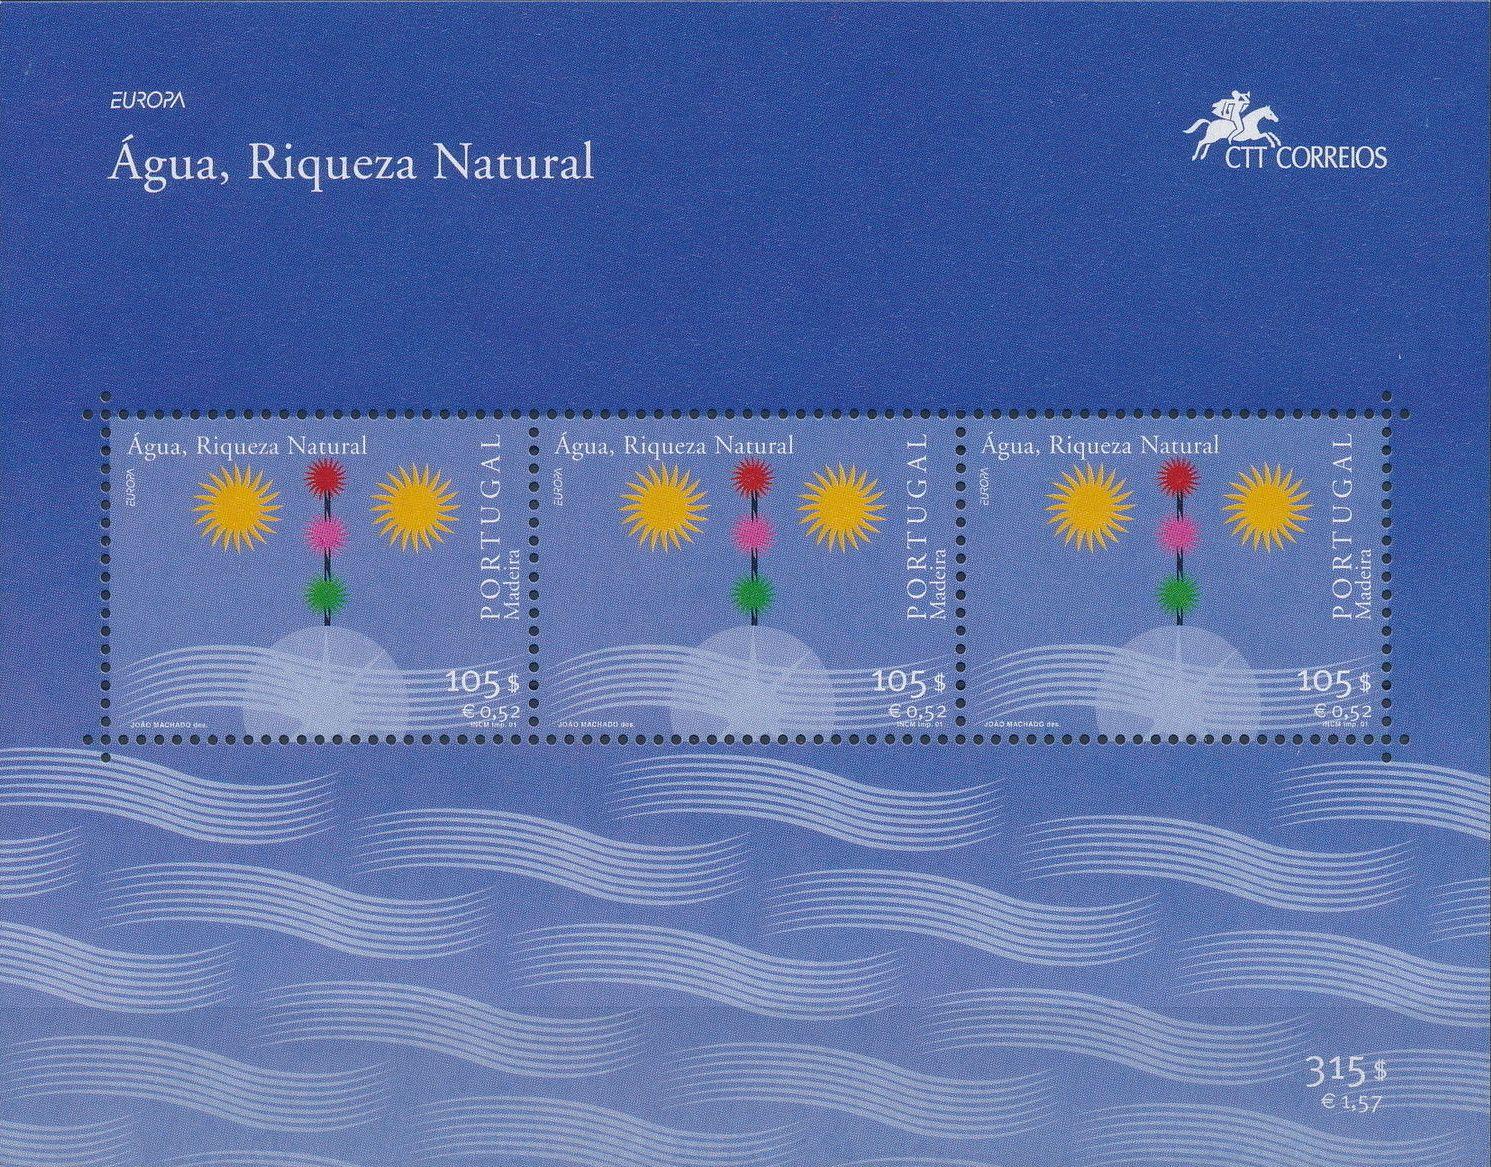 Madeira 2001 Europa - Water, natural wealth